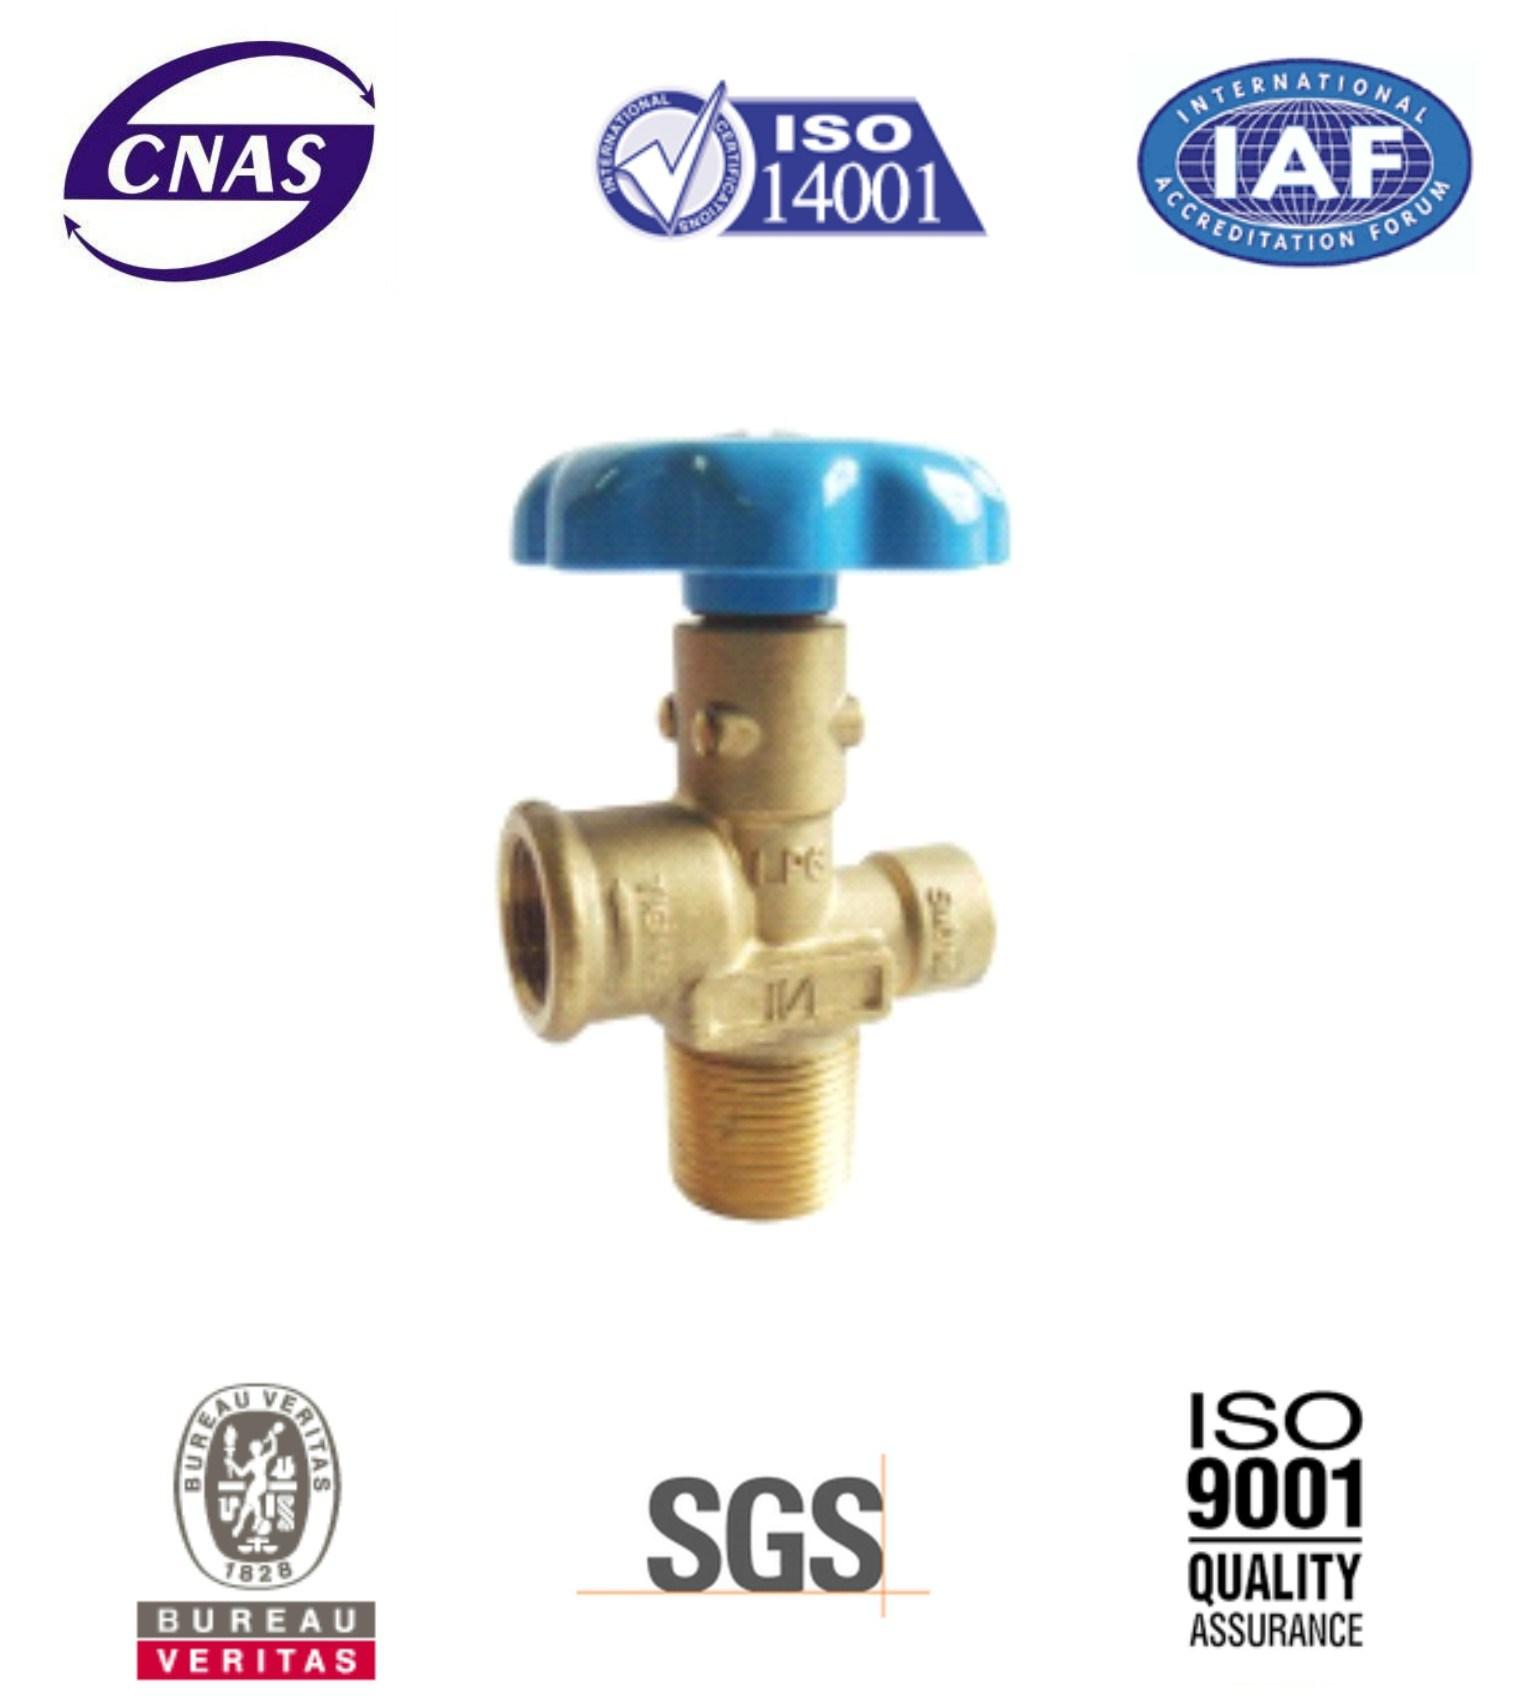 LPG Cylinder Valve - Gas Cylinder Valve